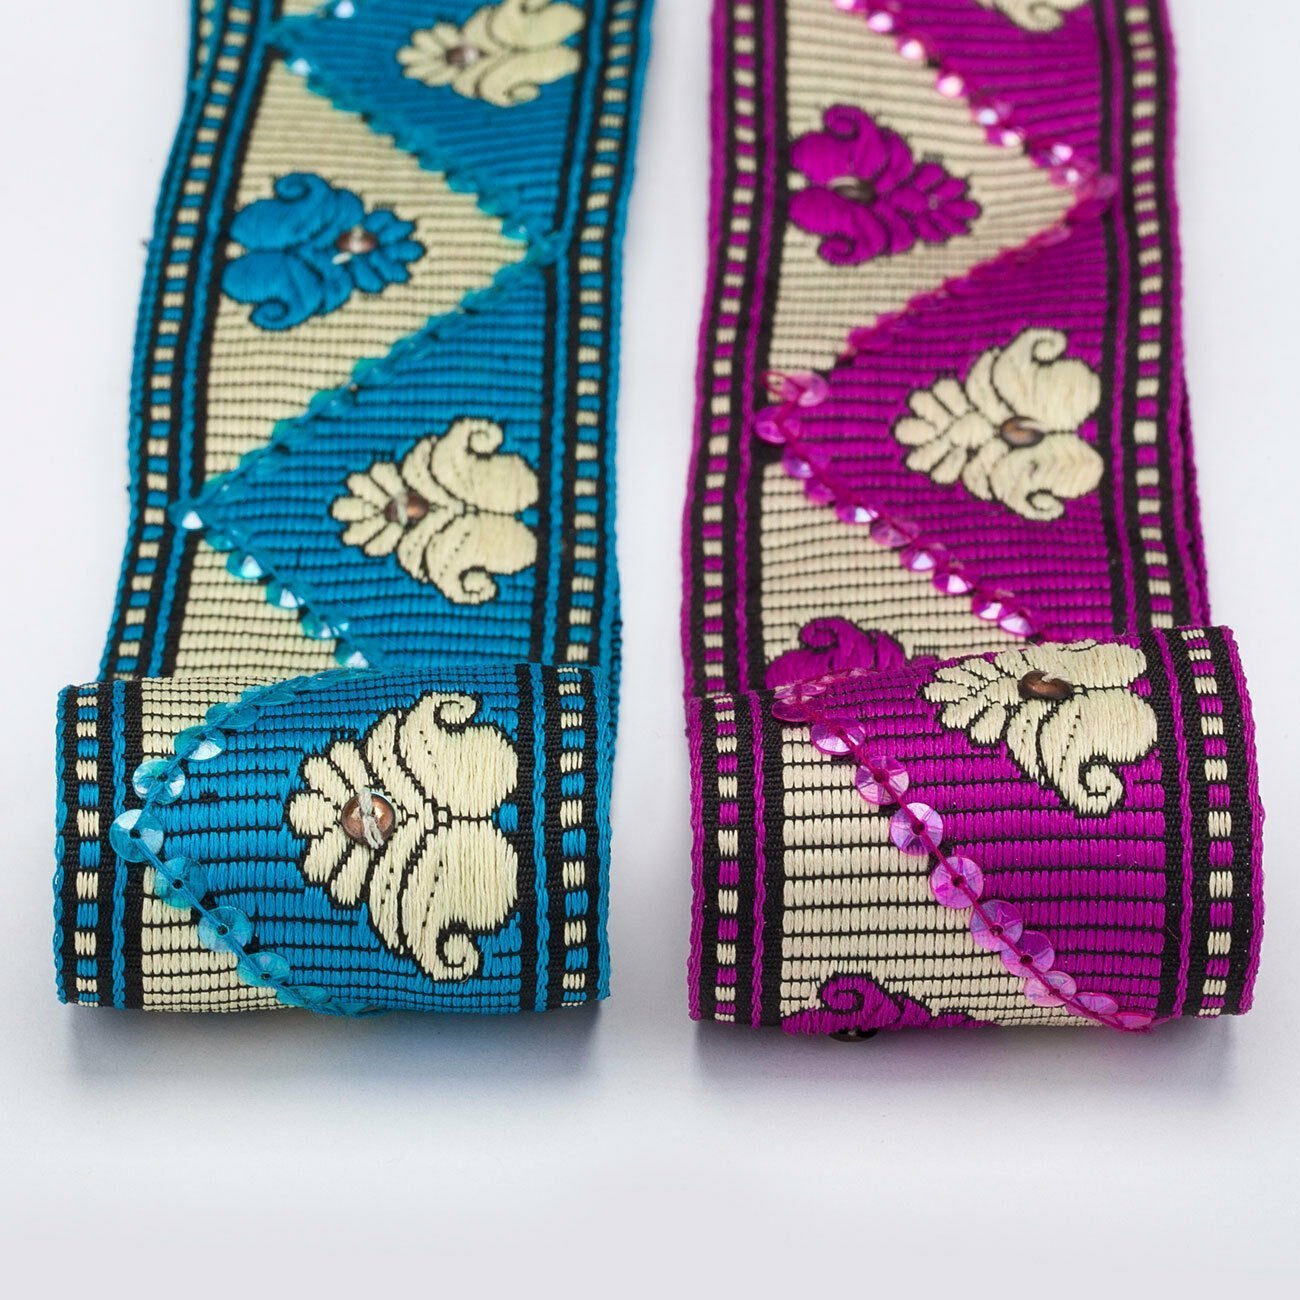 Neotrims Embroidery Ribbon Indian Sari Salwar Kameez Sequin Trim Paisley Lotus